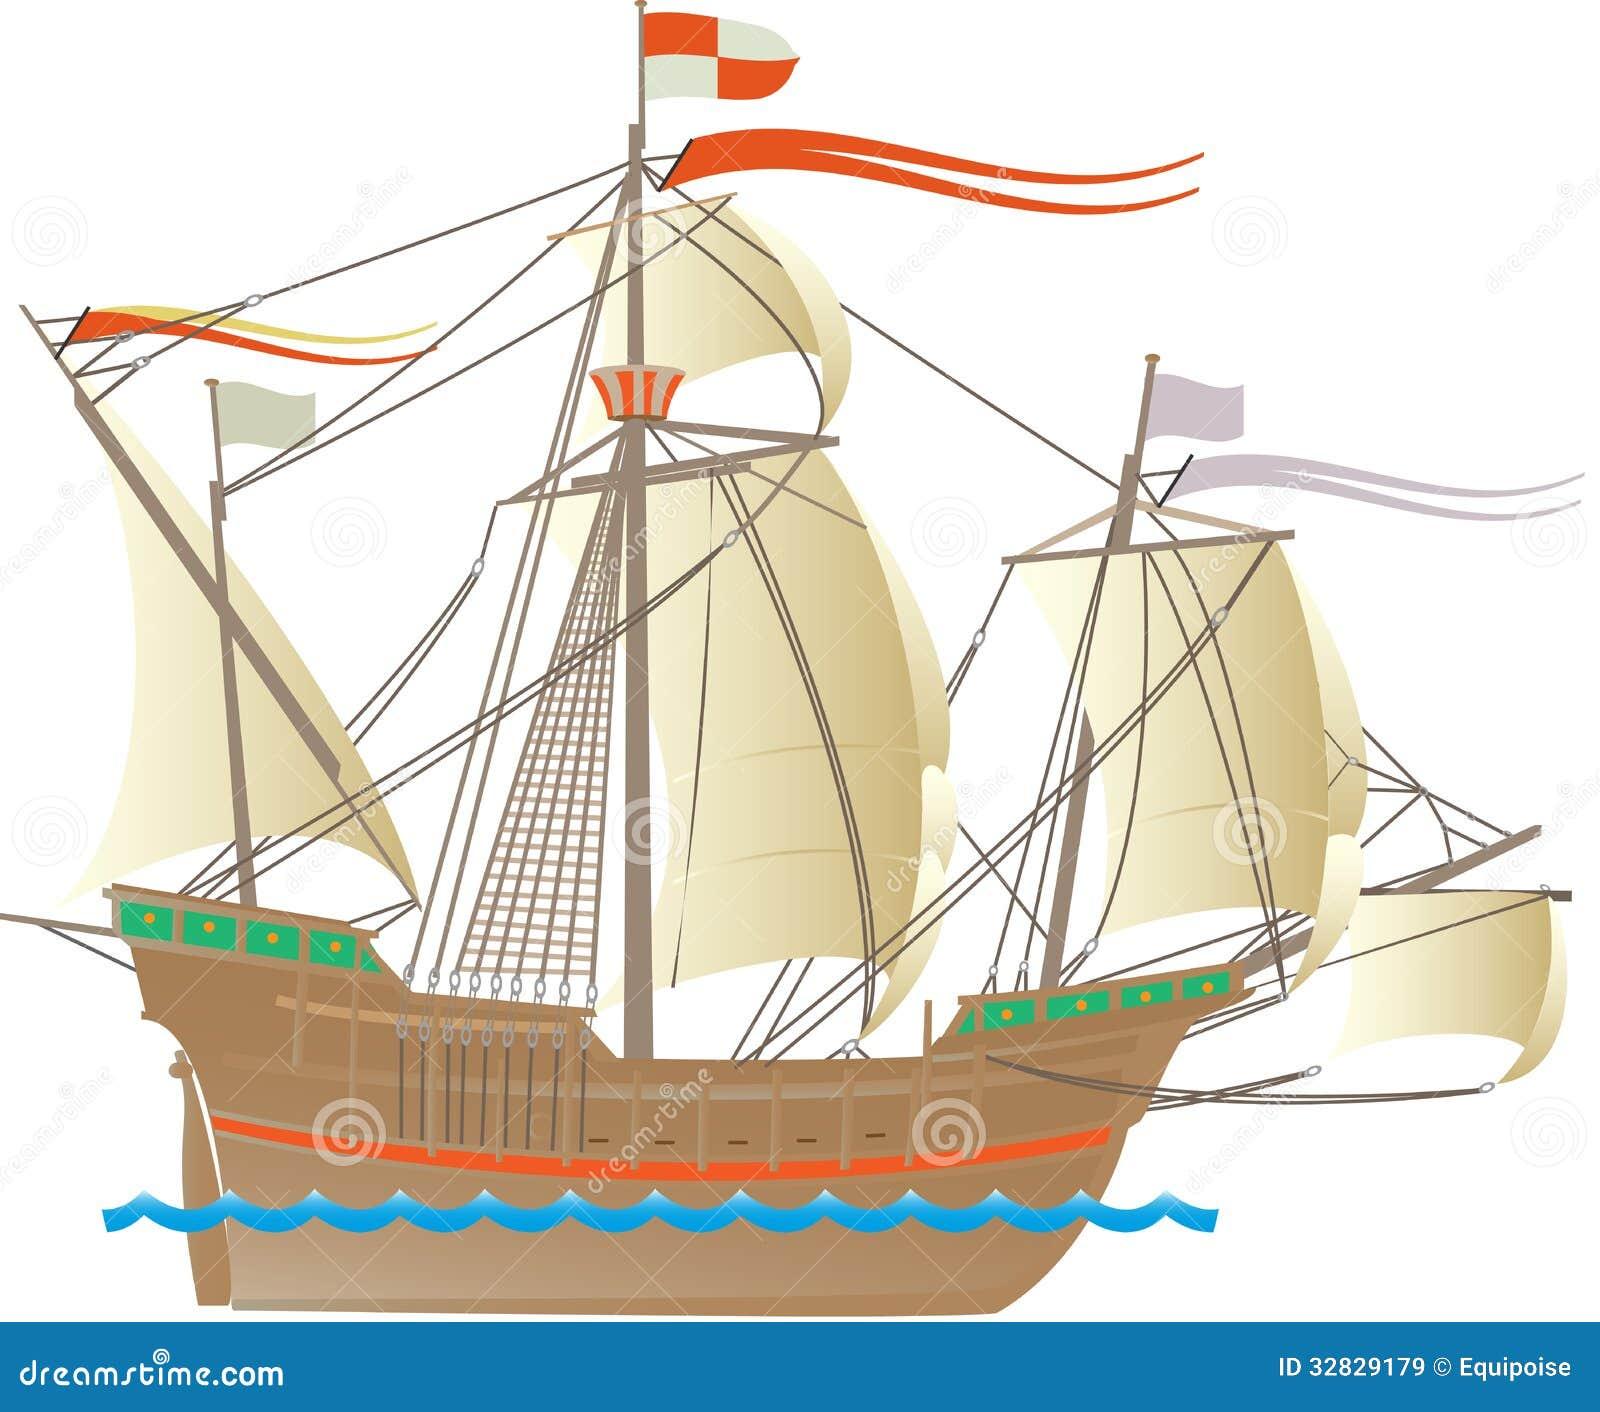 columbus ship royalty free stock images image 32829179